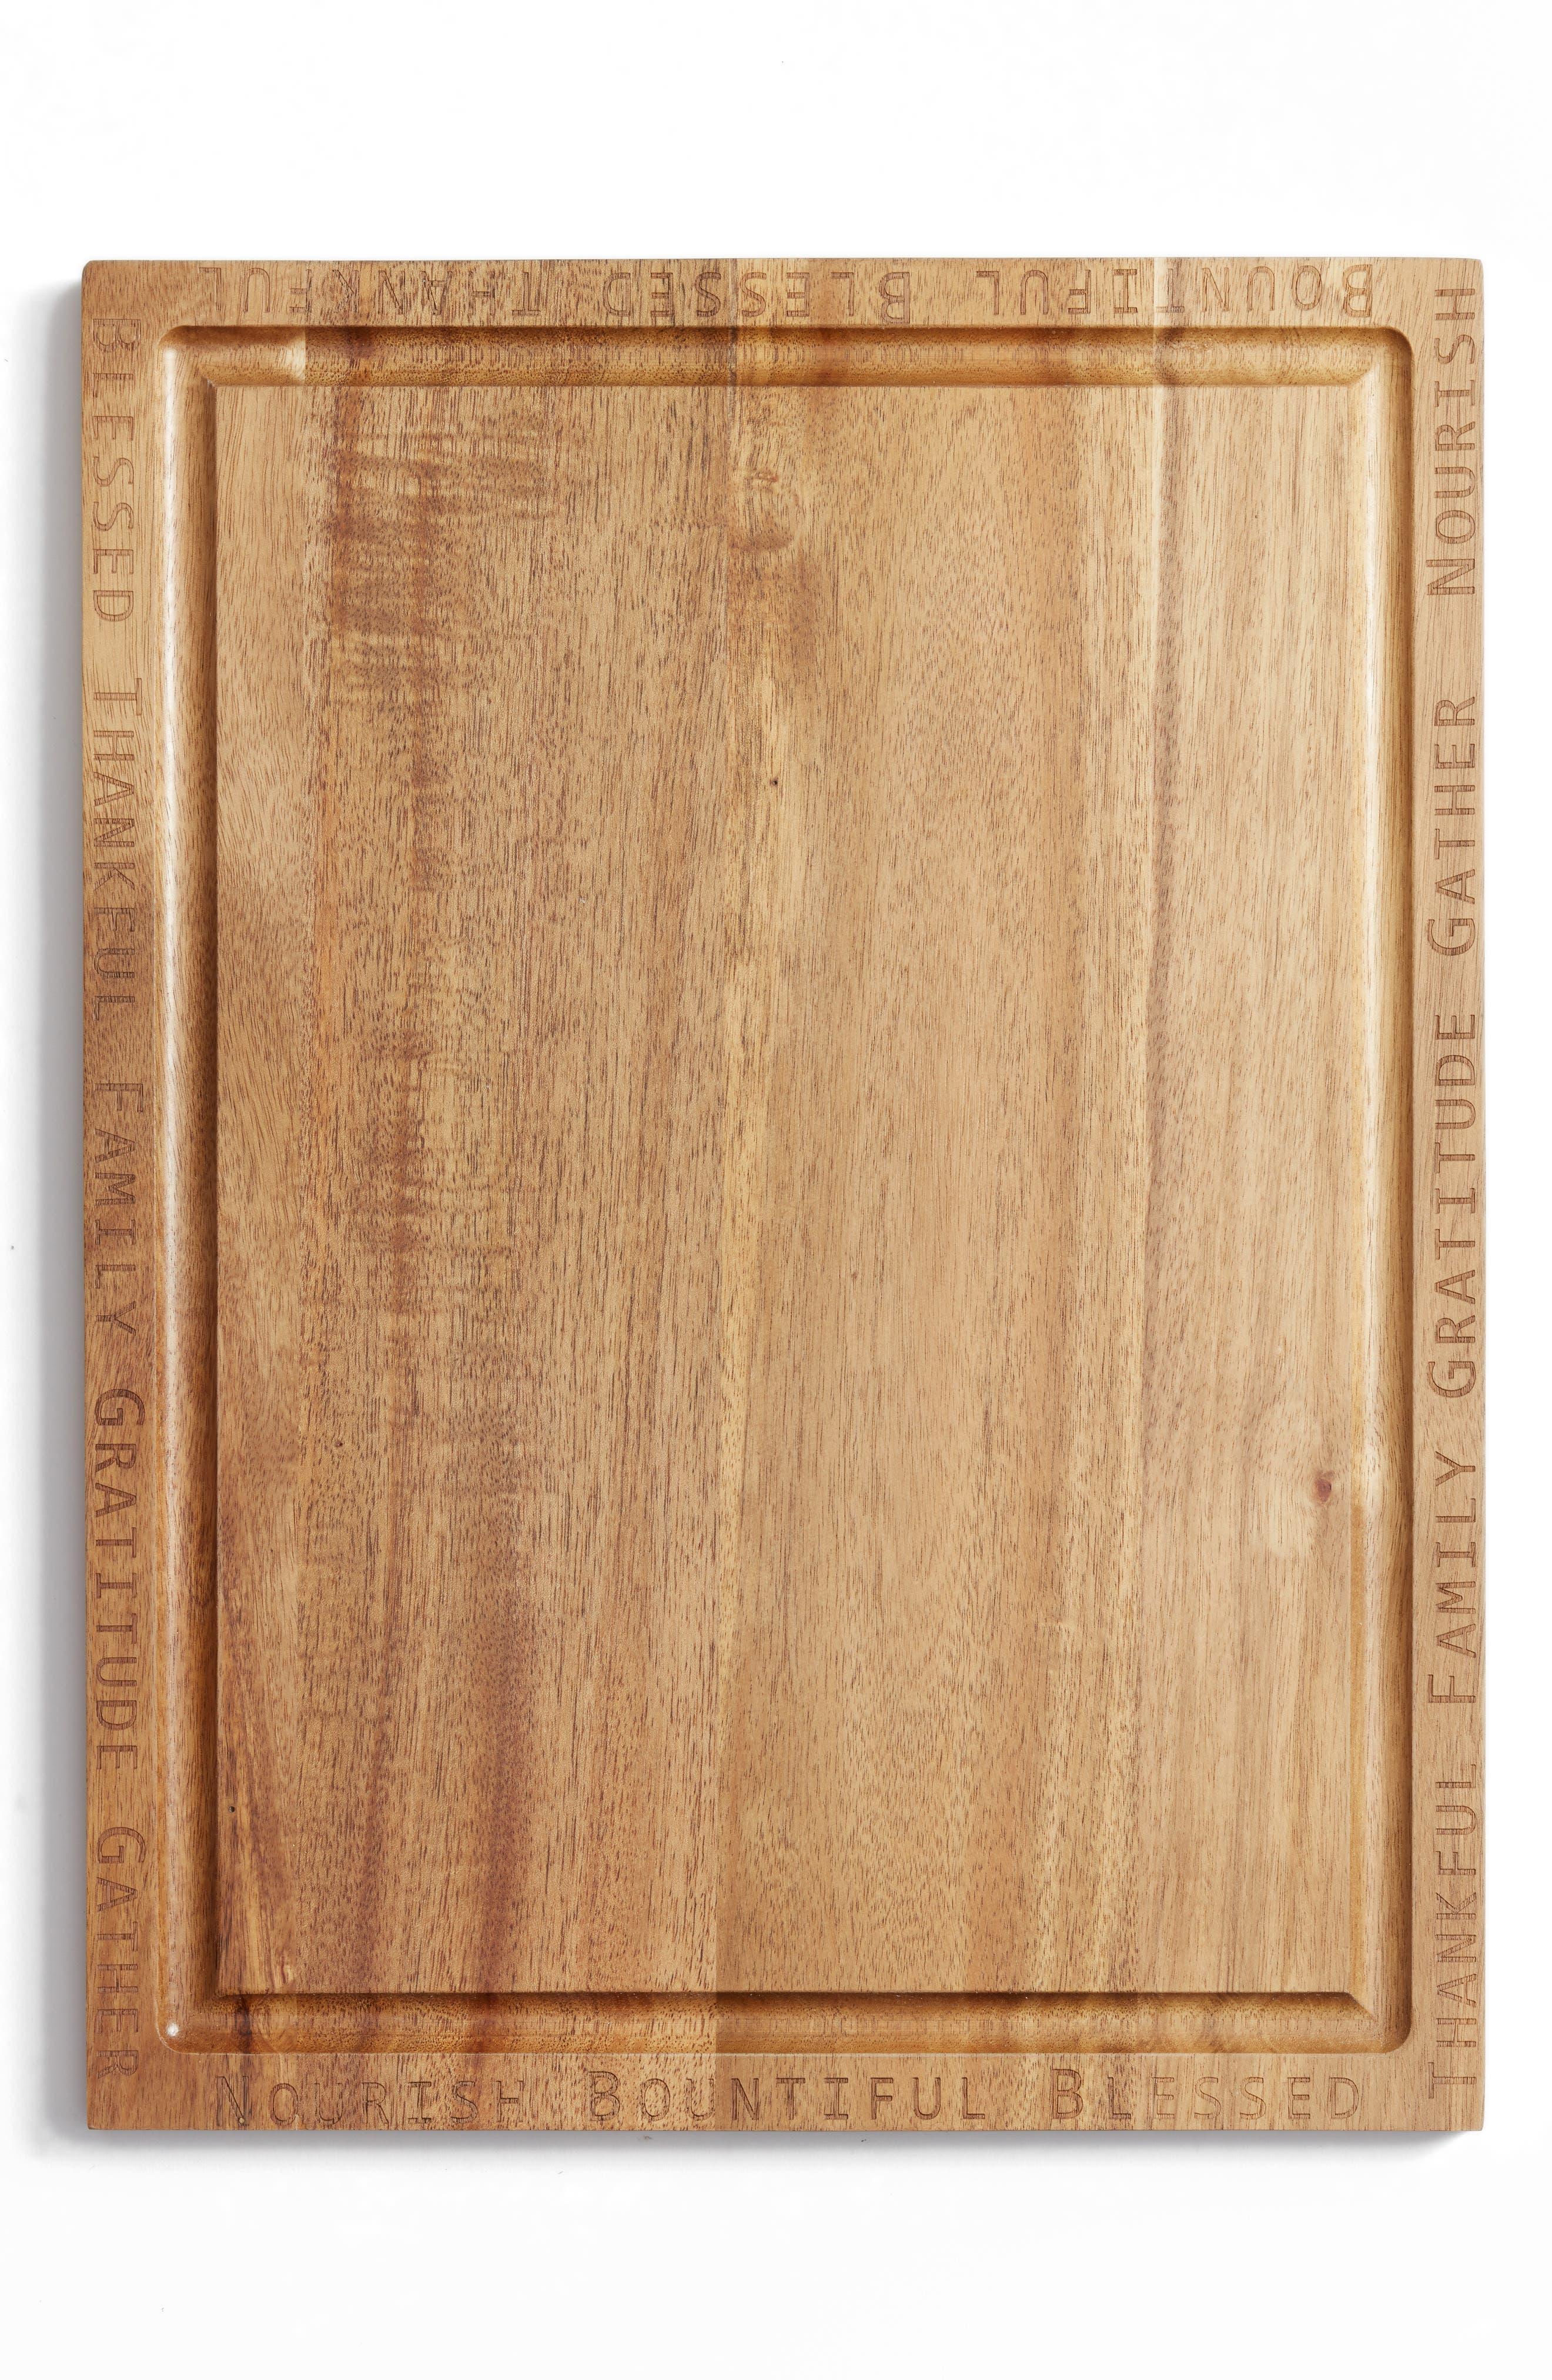 Acacia Wood Cutting Board,                             Main thumbnail 1, color,                             Brown Multi